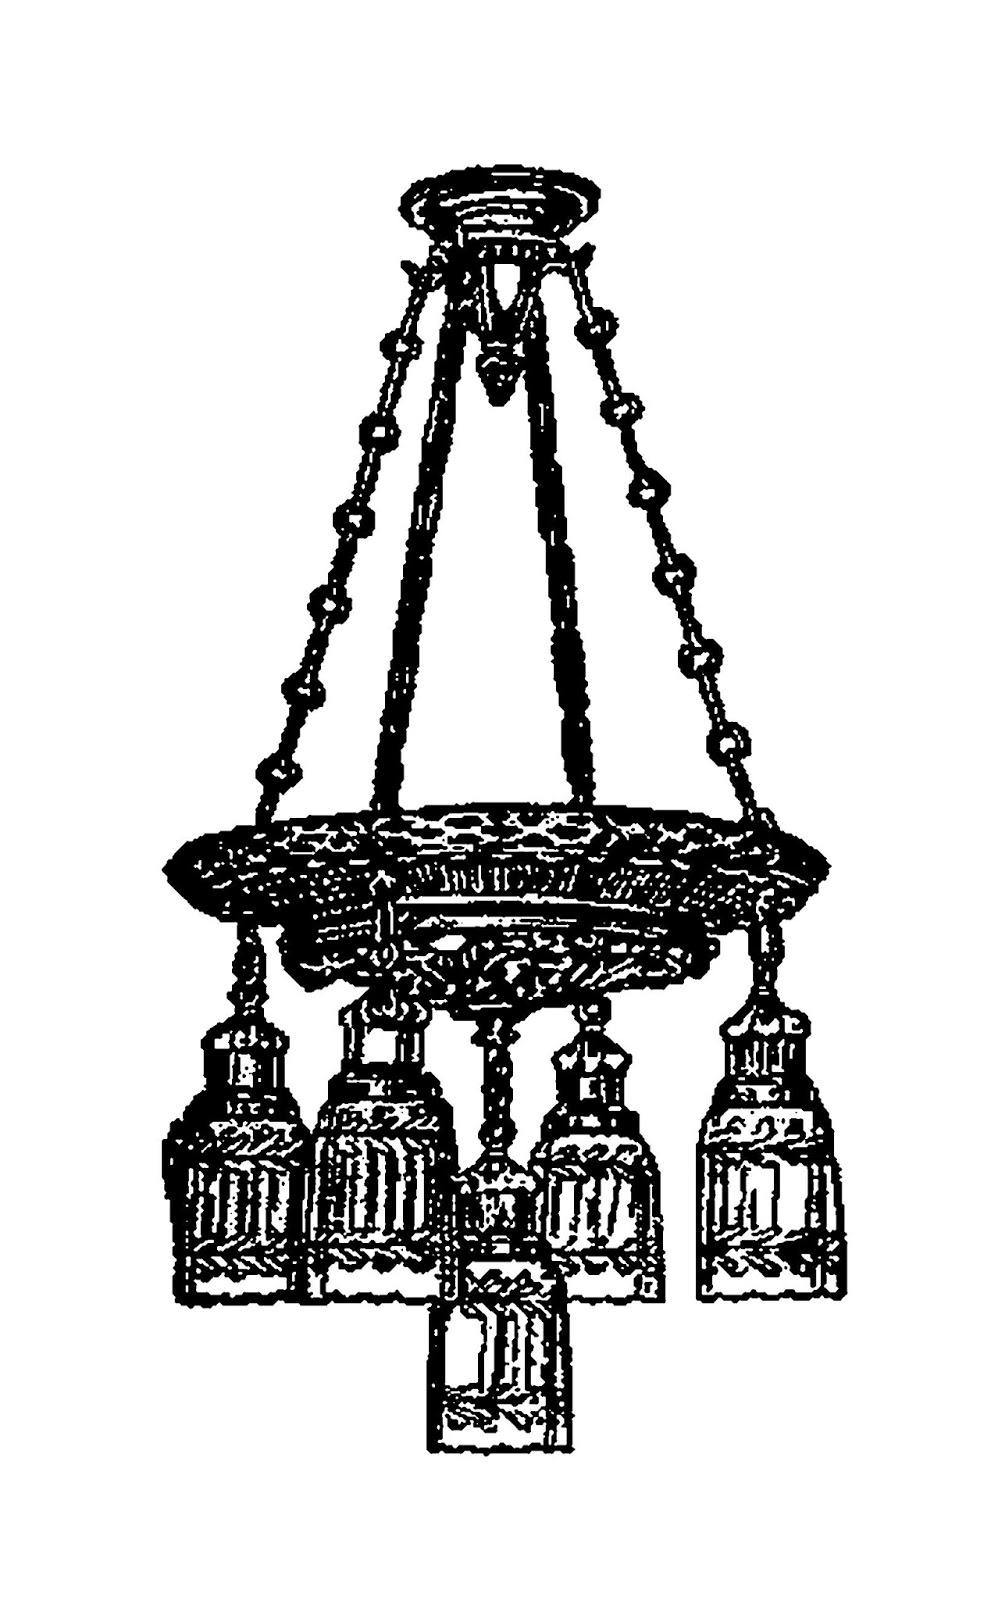 Chandelier clipart free download best chandelier clipart on 991x1600 chandelier clipart home decor arubaitofo Gallery